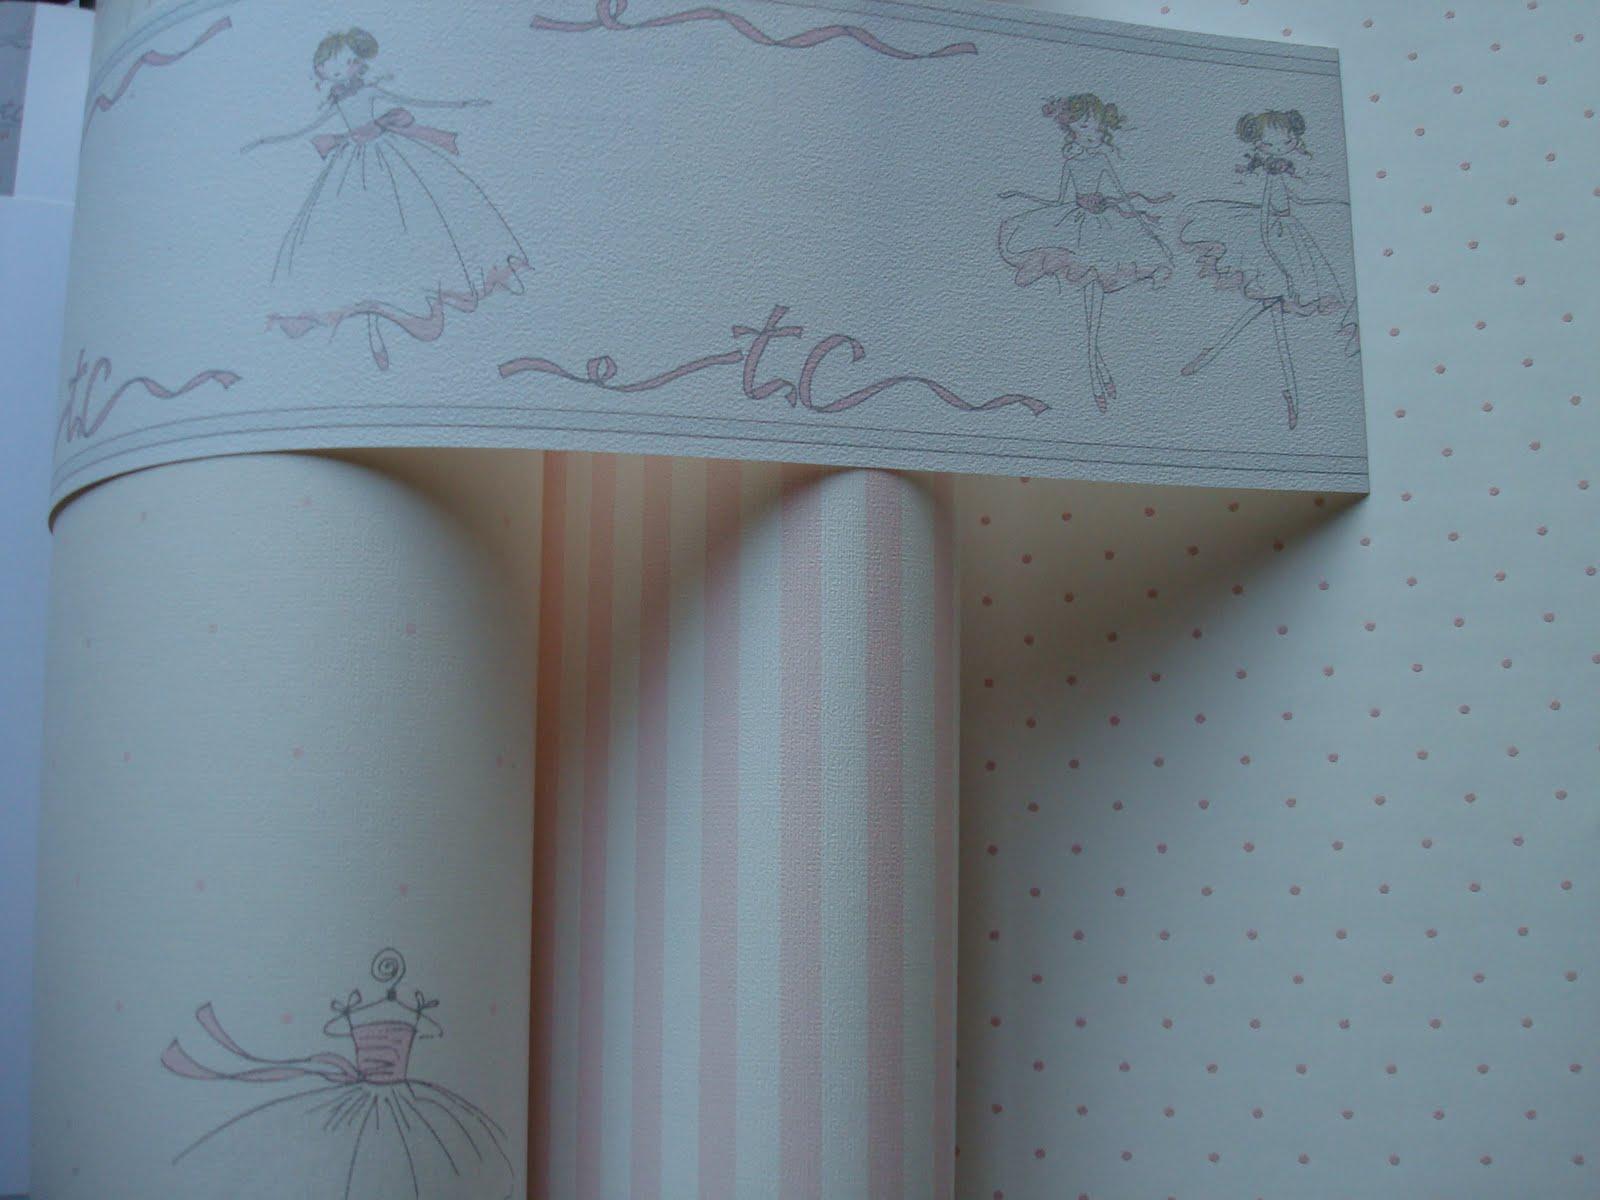 Edyta dise o decoraci n blog de decoraci n enero 2012 - Papeles pintados la maison ...